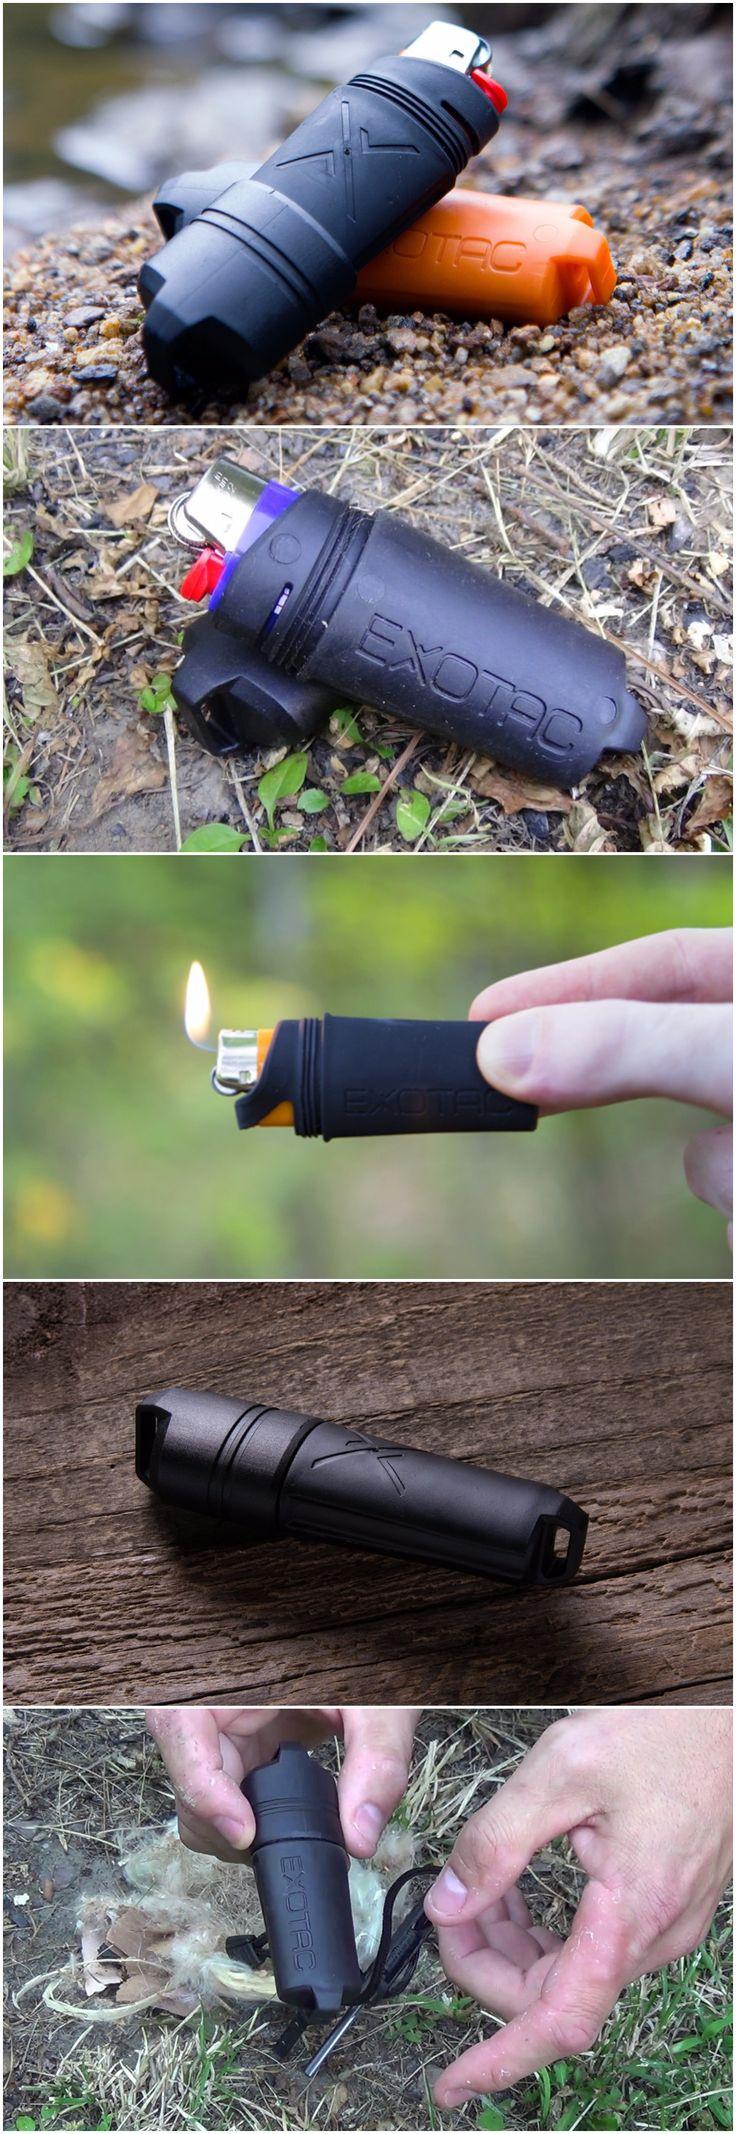 Exotac EDC fireSLEEVE waterproof lighter, Black, No Lighter Black - Everyday Carry Gear